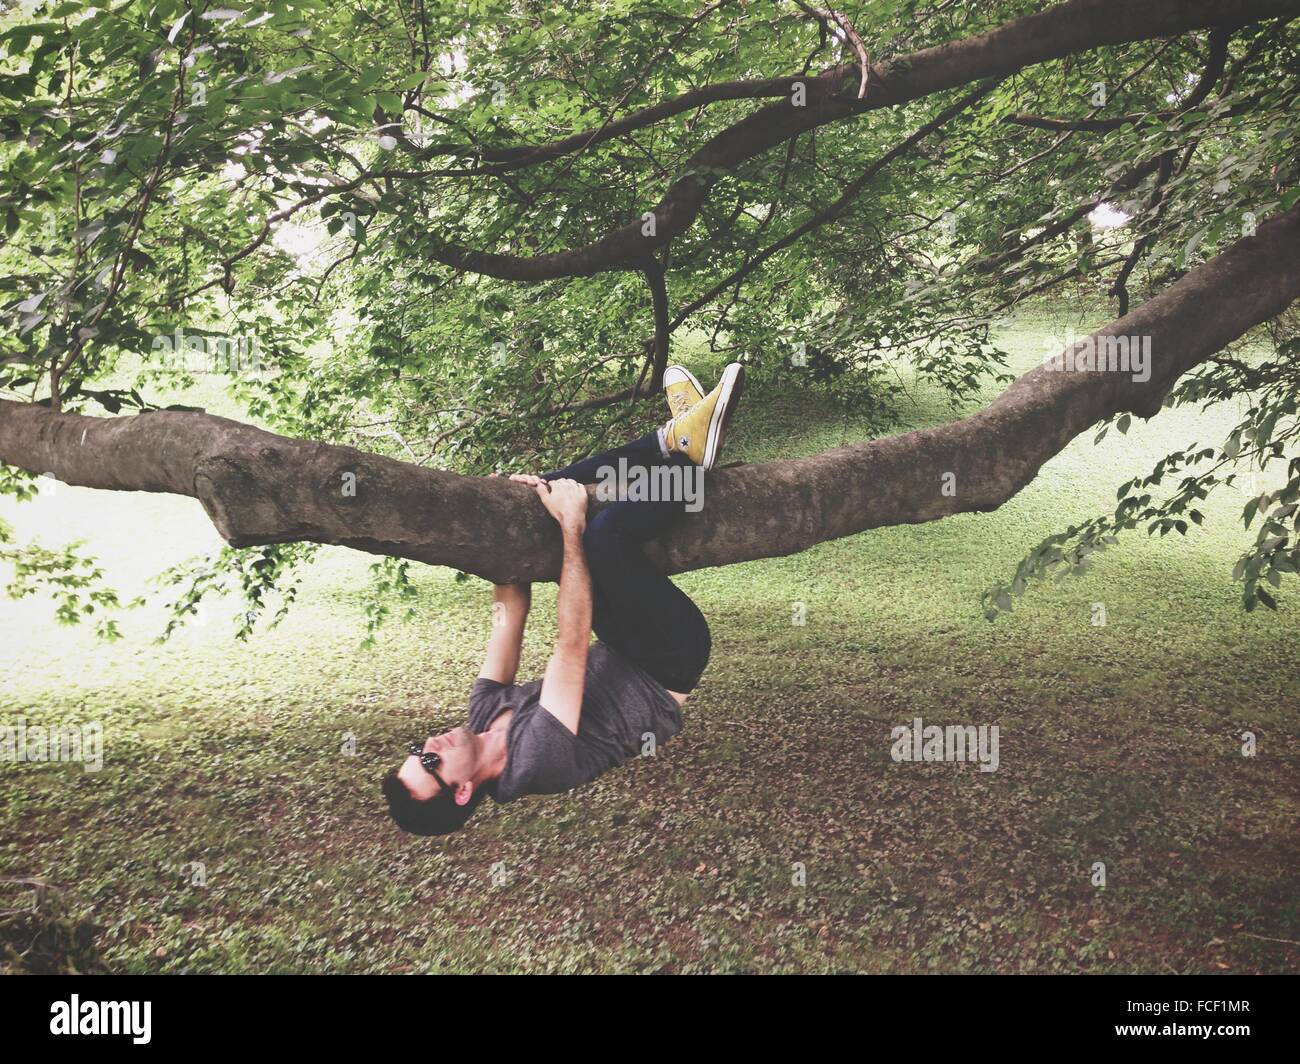 Man Climbing Tree - Stock Image